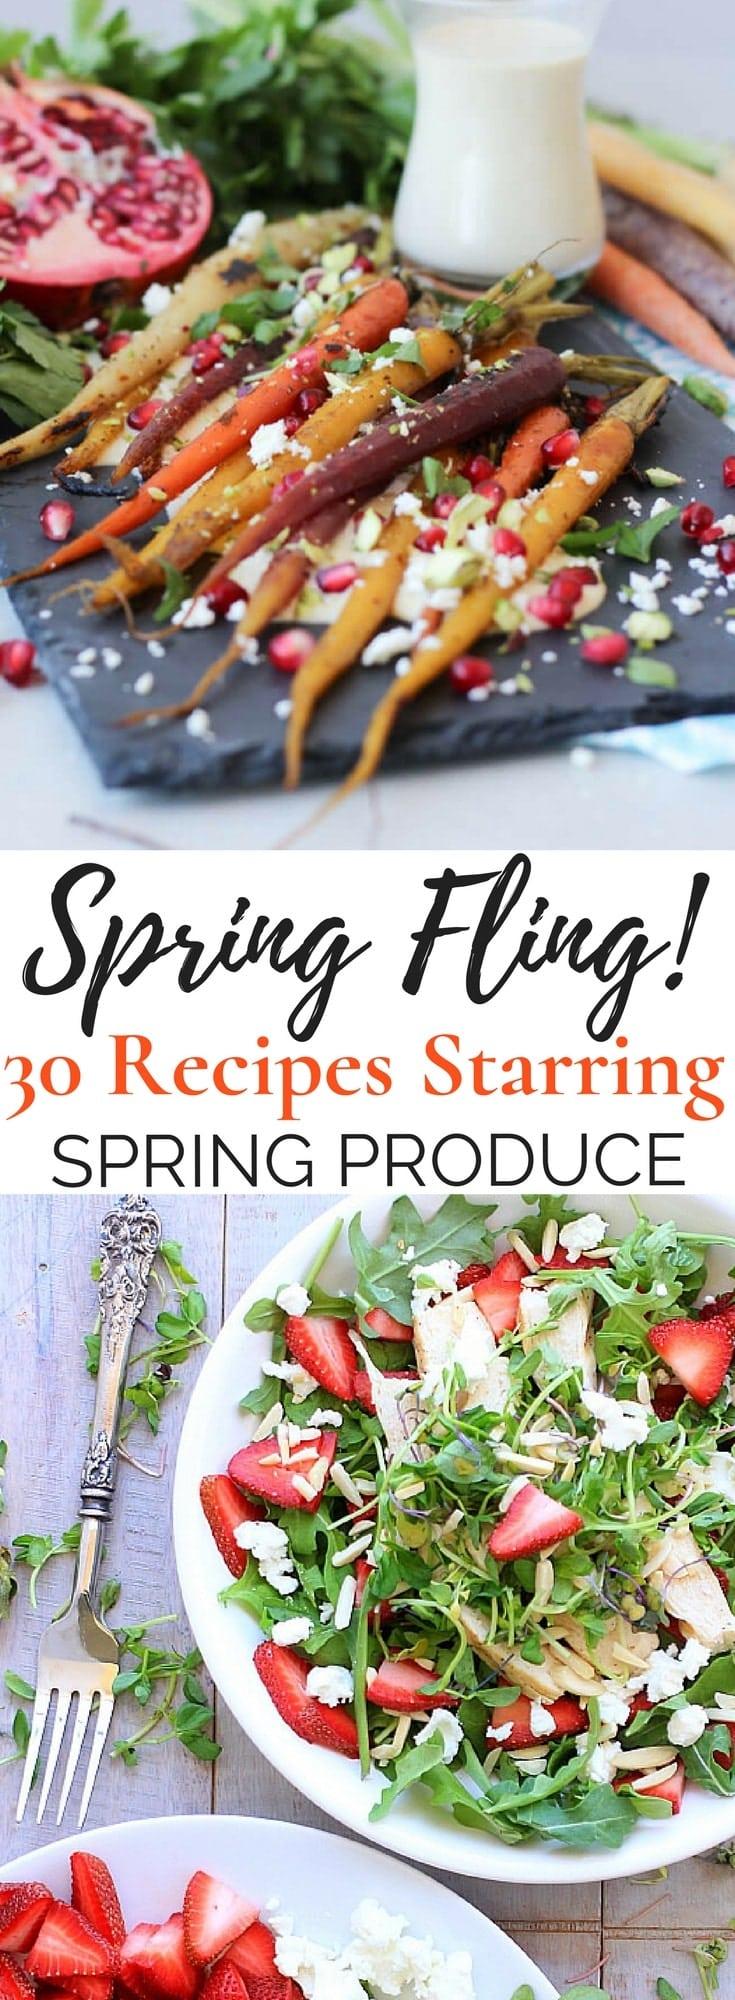 30 Healthy Vegetarian Spring Recipes featuring seasonal produce from A to Z including artichokes, arugula, asparagus, carrots, leeks, mango, peas, radishes, rhubarb, and strawberries. Enjoy! #spring #glutenfree #vegetarian #healthyrecipes